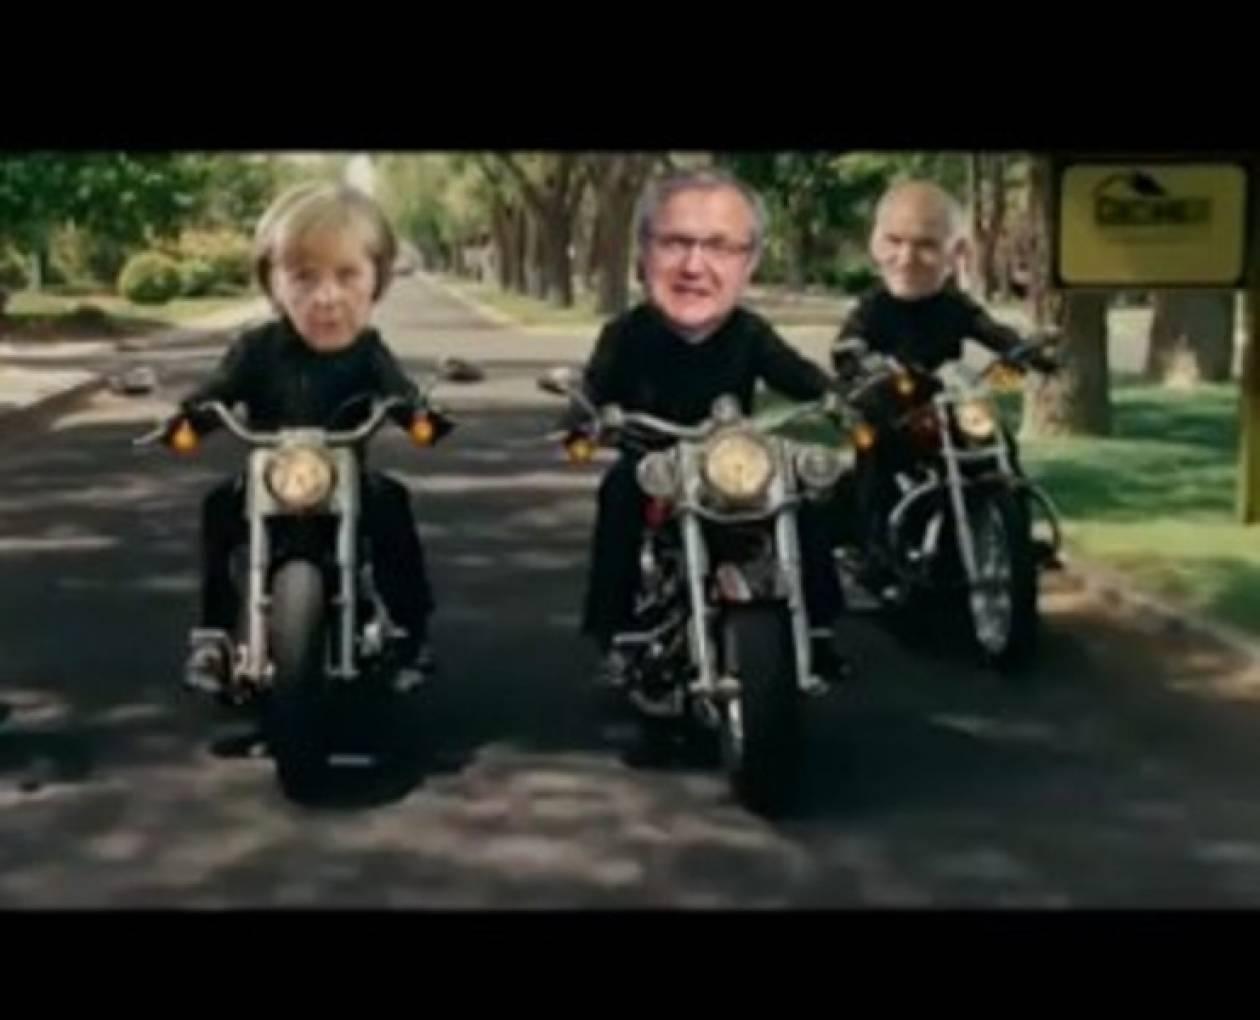 VIDEO-ΑΠΟΚΑΛΥΨΗ: Πως θα πέσει ο Γιωργάκης!